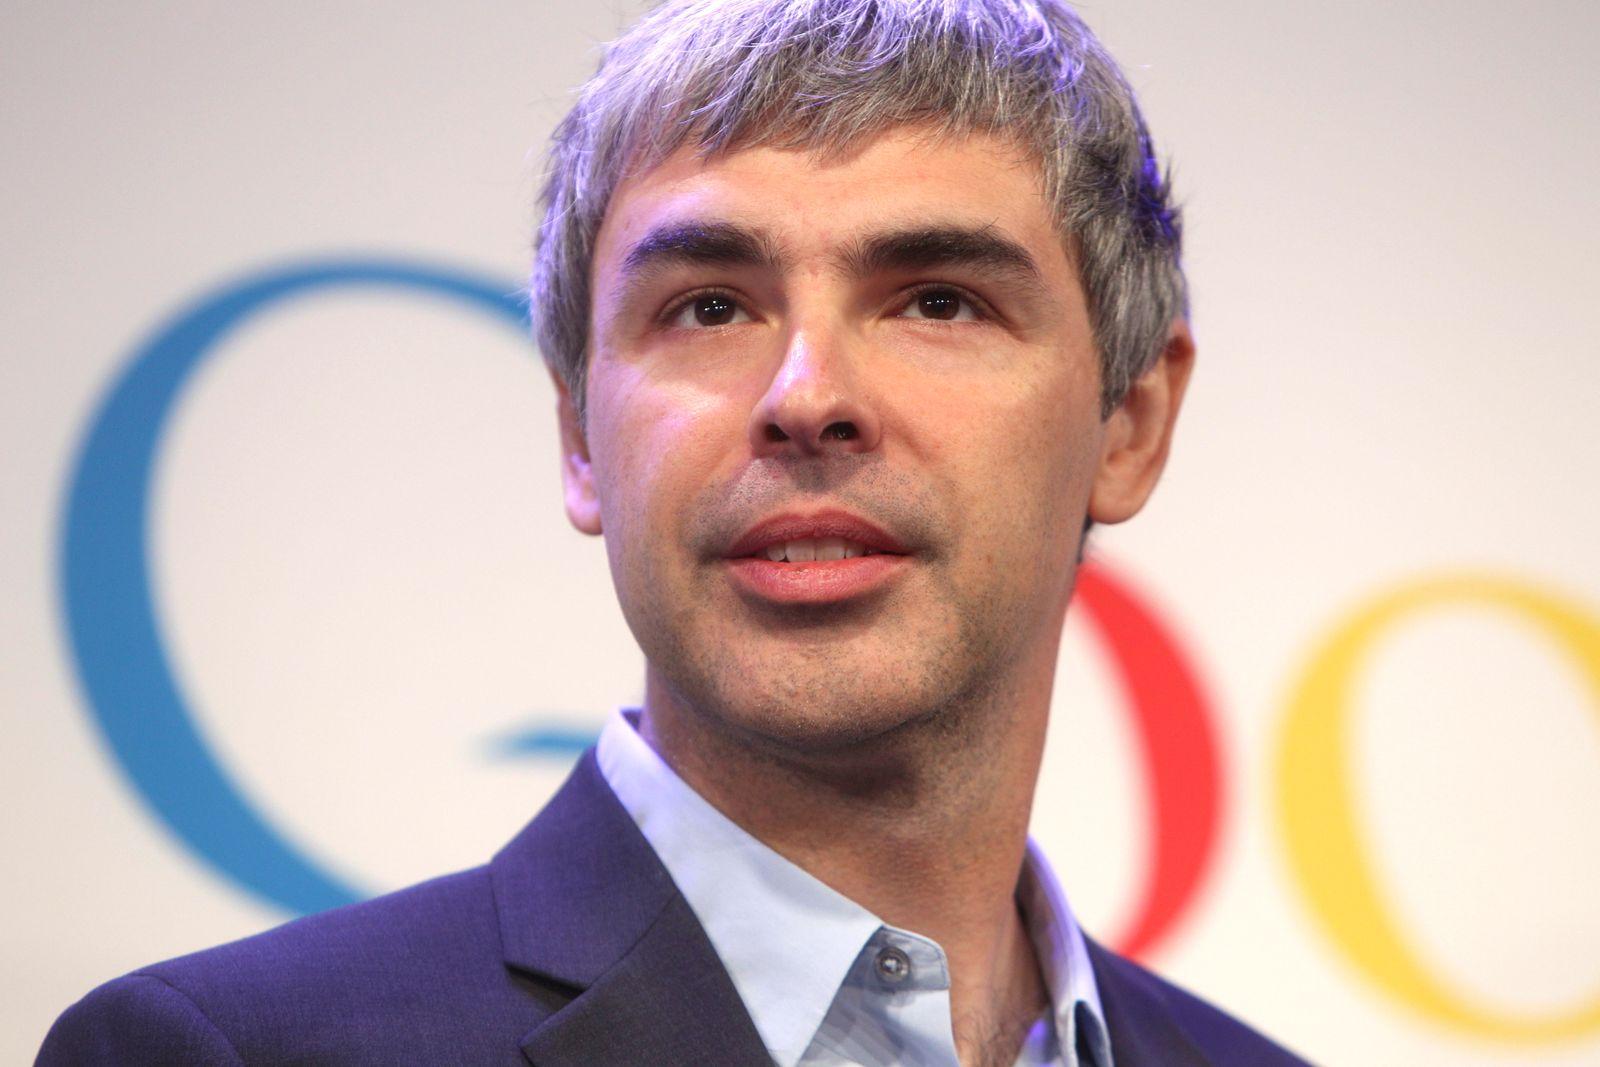 Larry Page / Google